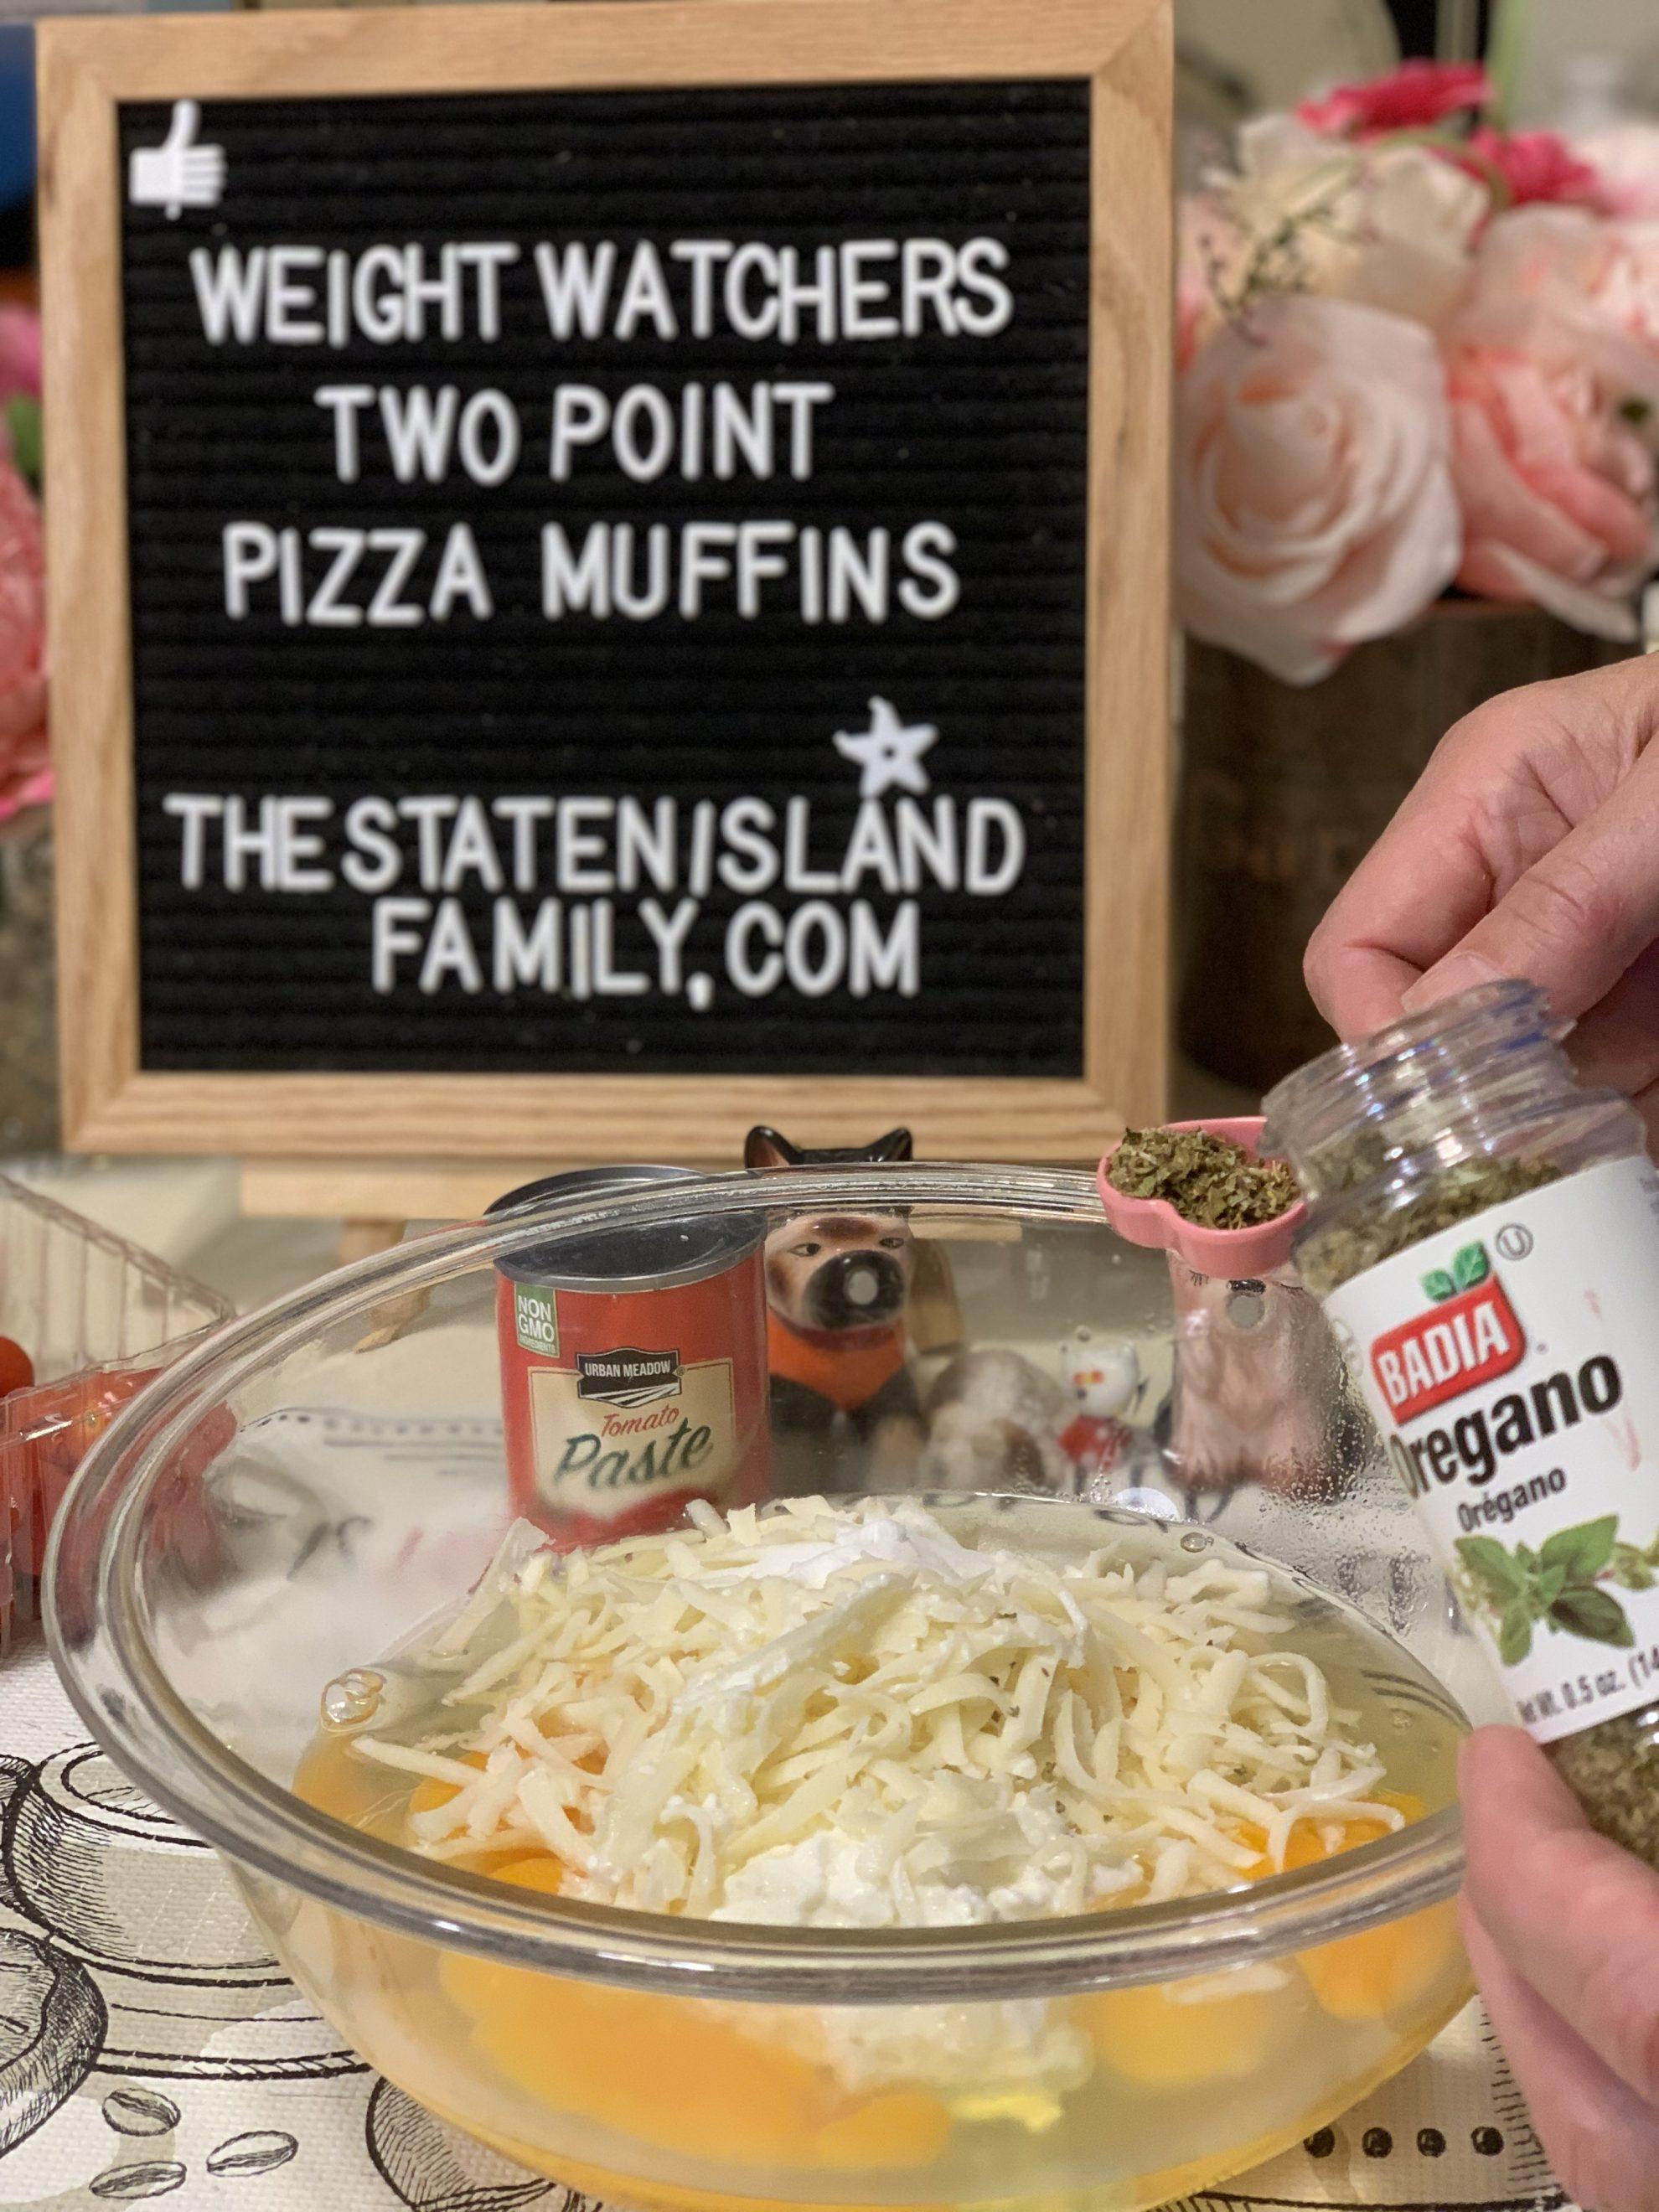 Weight Watchers Pizza Muffins